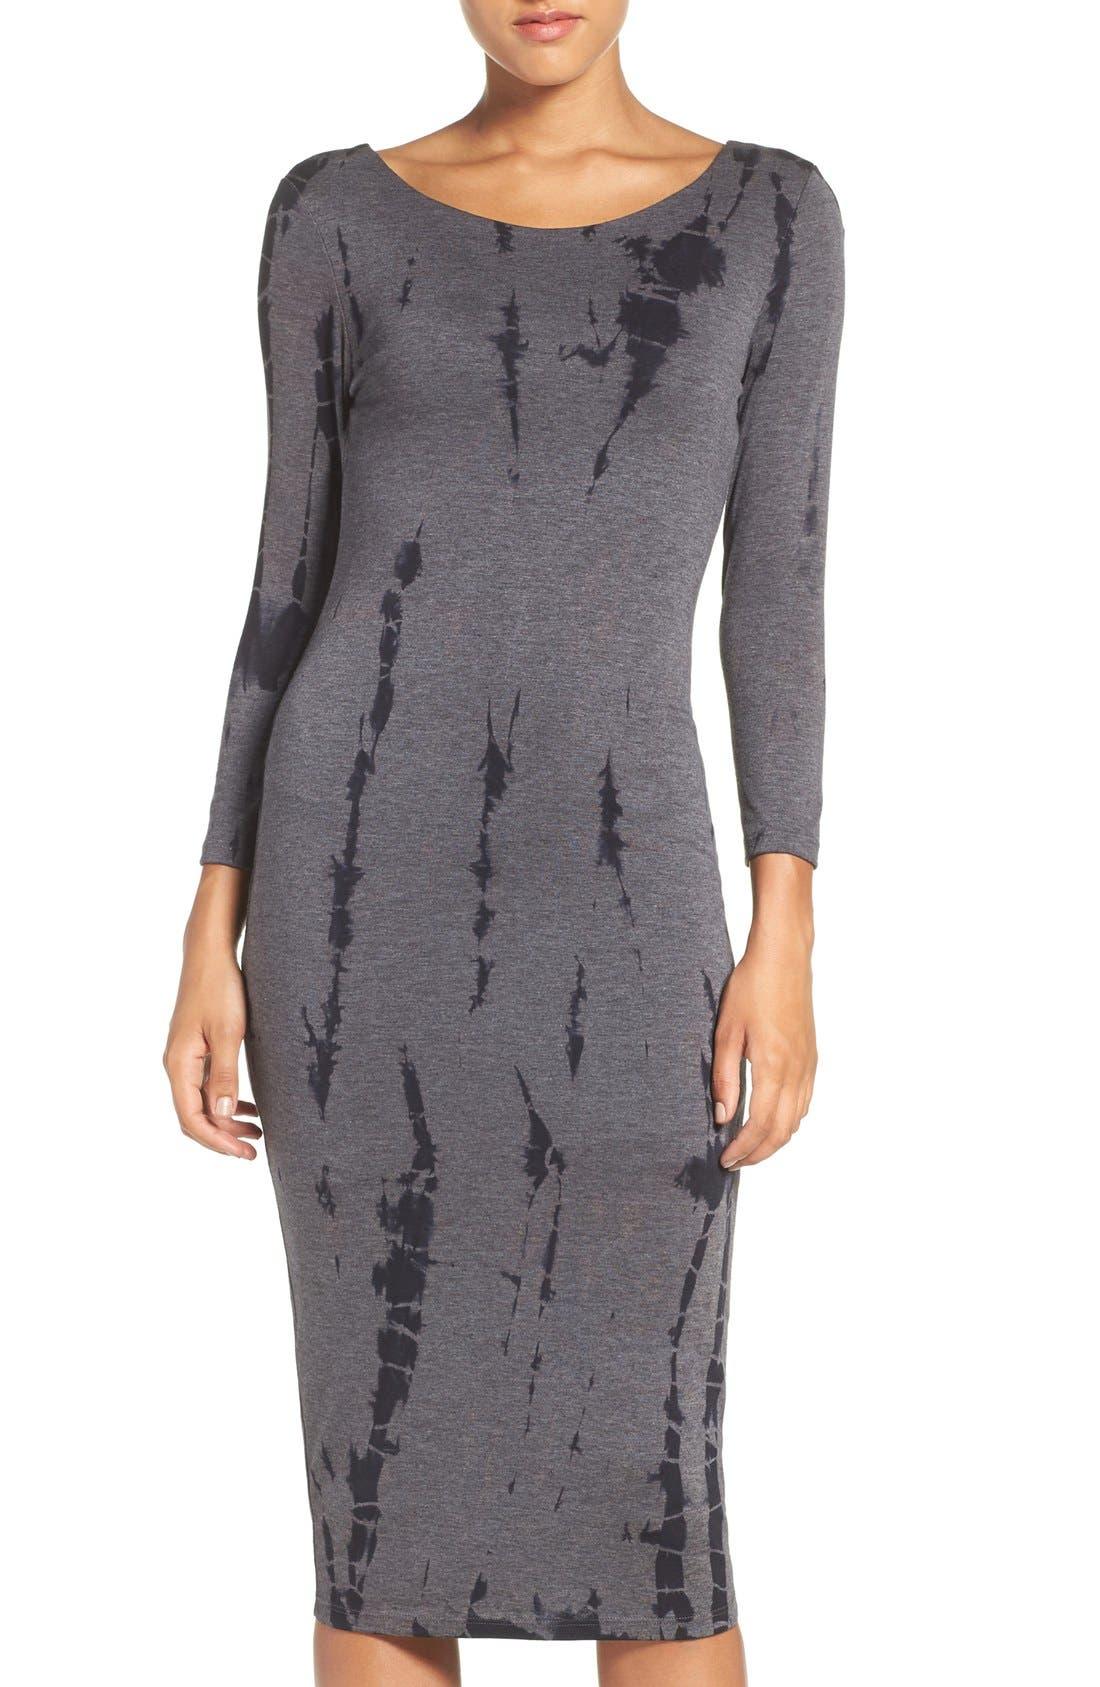 Cutout Back Tie Dye Body-Con Dress,                             Main thumbnail 1, color,                             Charcoal Ink